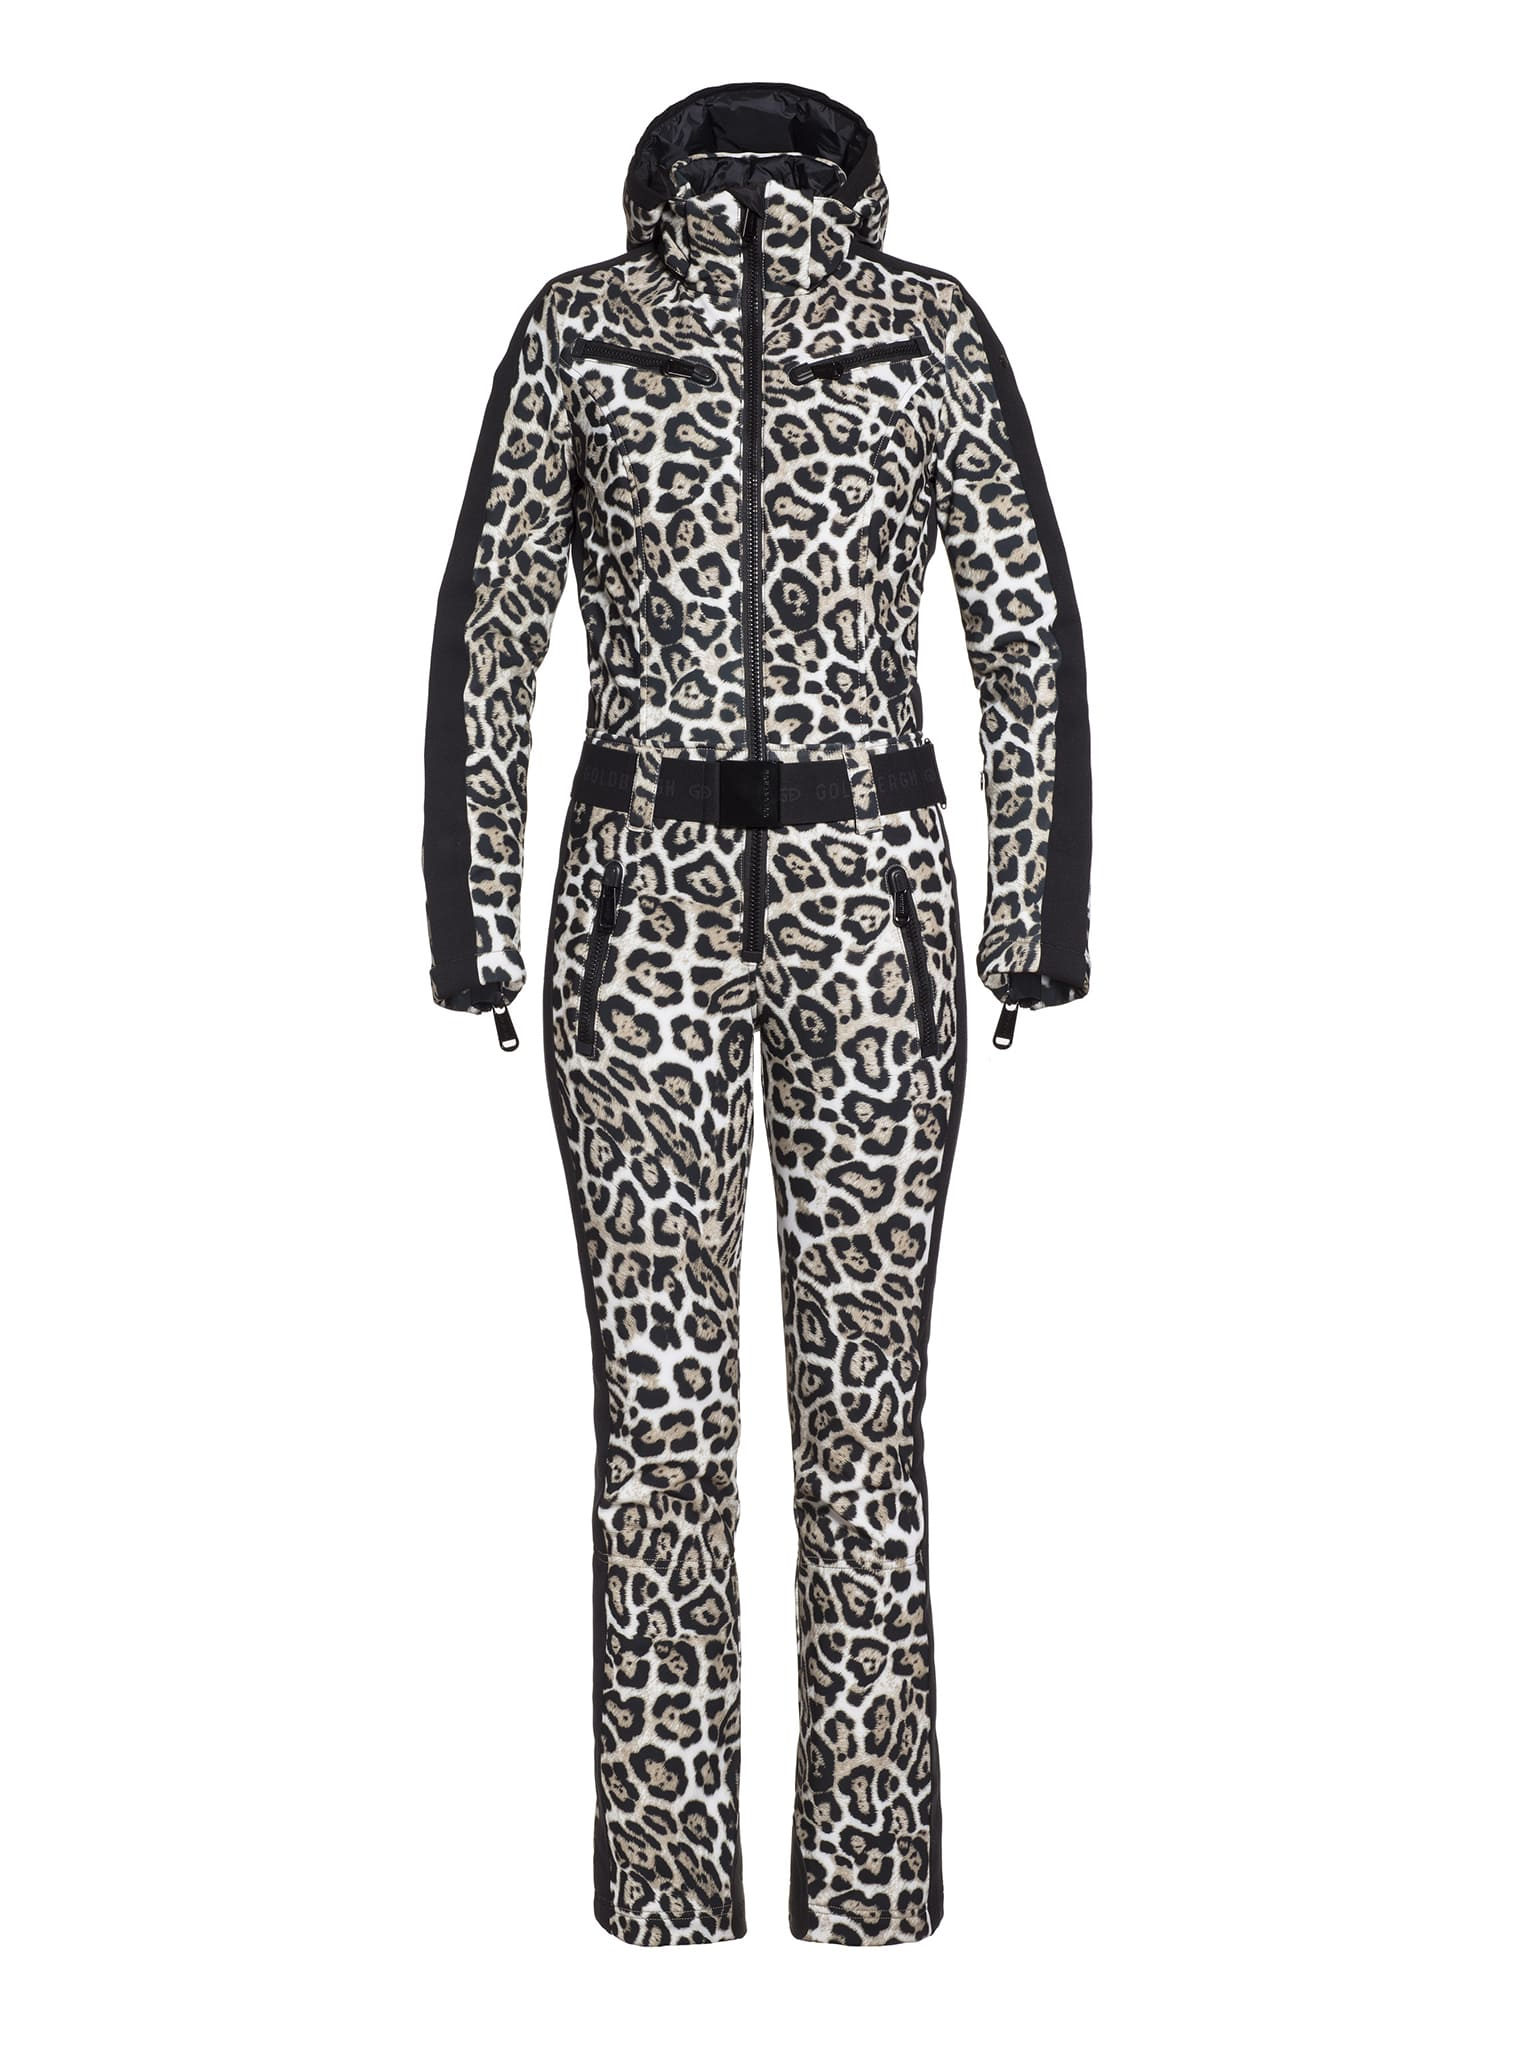 Goldbergh Cougar Jumpsuit No Fur 2020